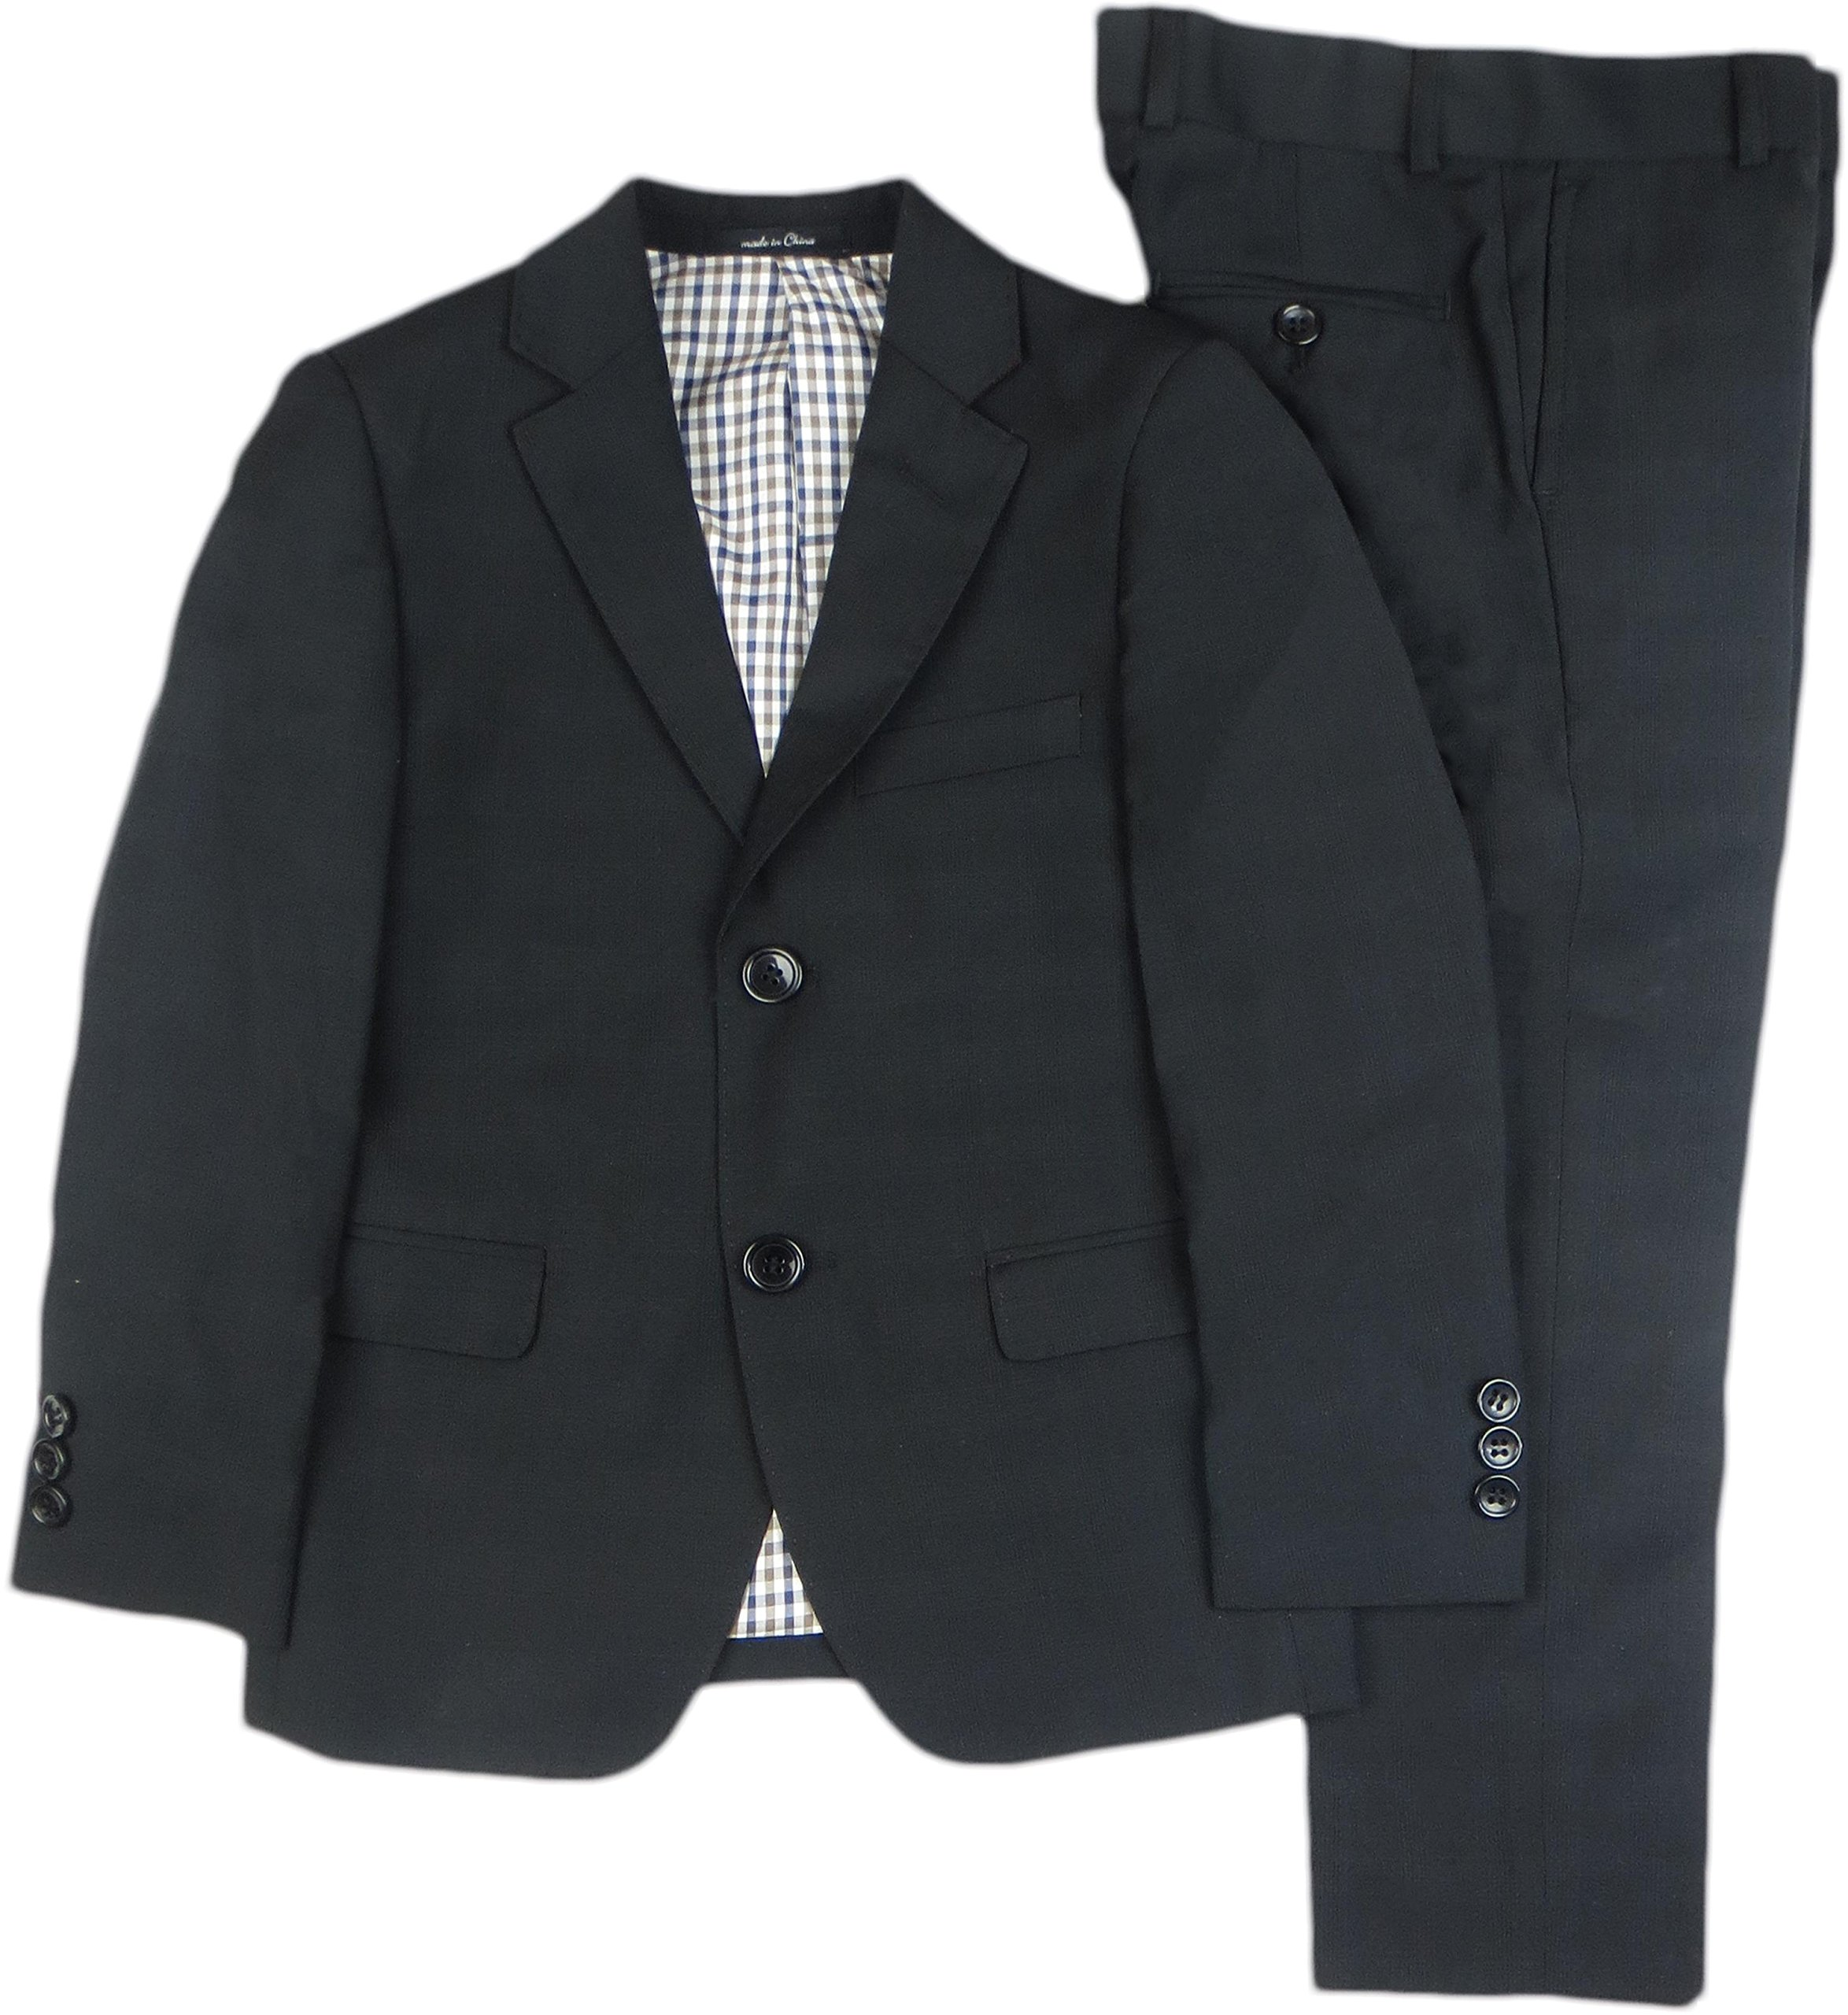 T.O. Collection Boys Black Suit (Slim, Regular & Husky Fit) - 1609-12 - Black, 6 Slim by T.O. Collection